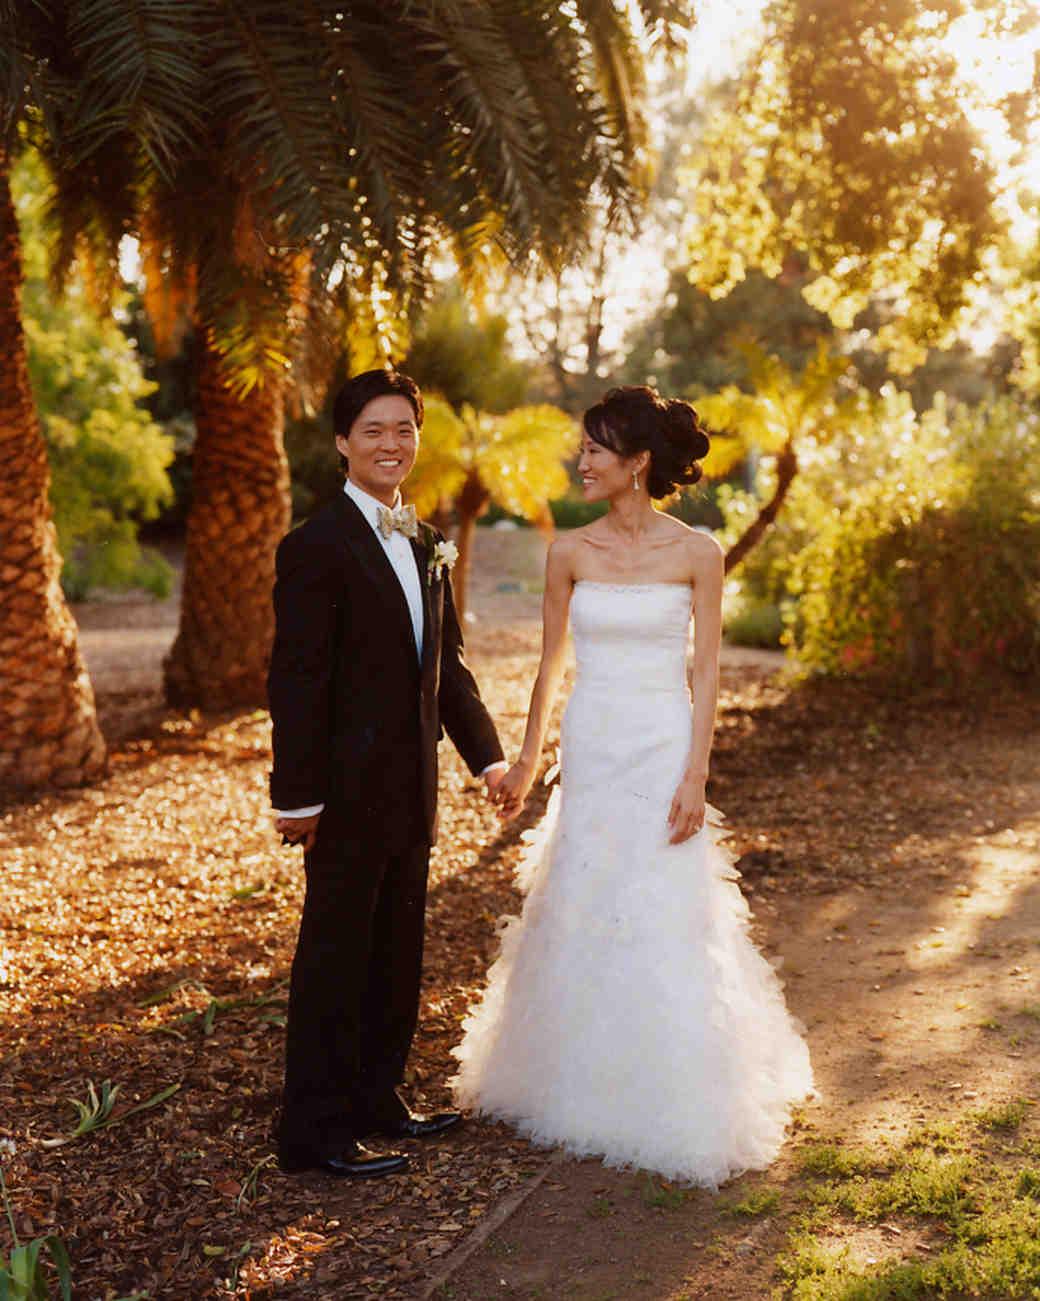 marriage-tips-minhee-truman-f06-wa102306-0215.jpg